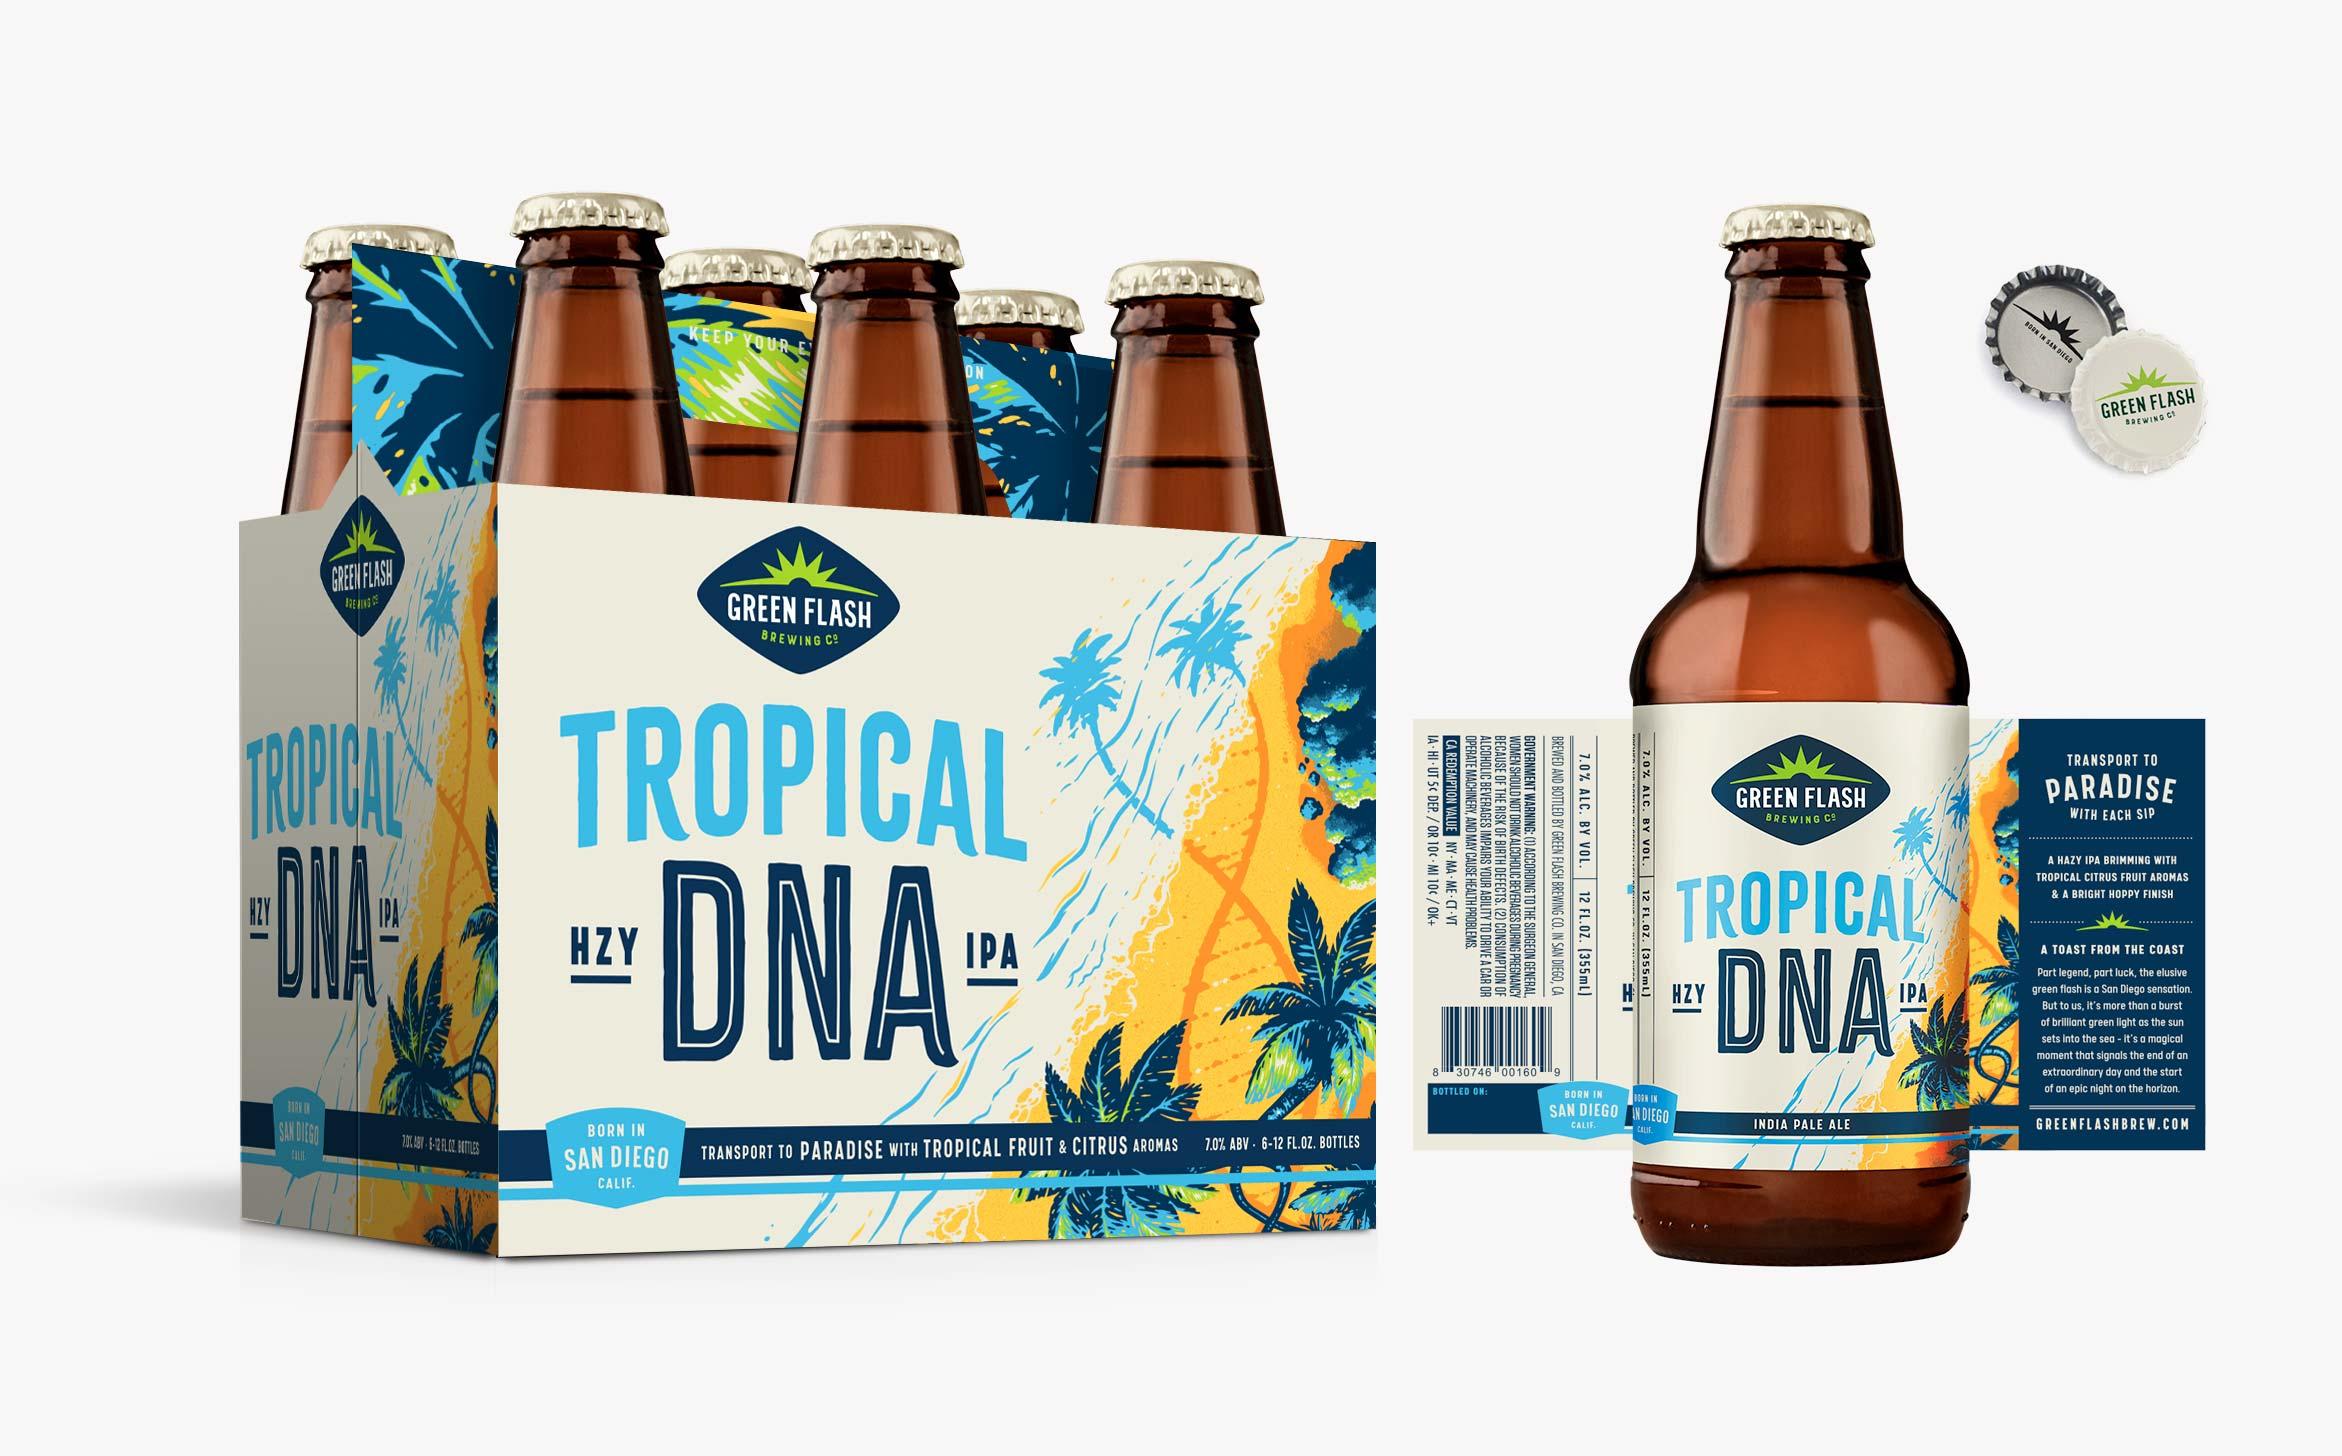 Green-Flash-Brewing-Rebrand-Tripocal-DNA-IPA-Package-Design-6-Pack-Bottle.jpg